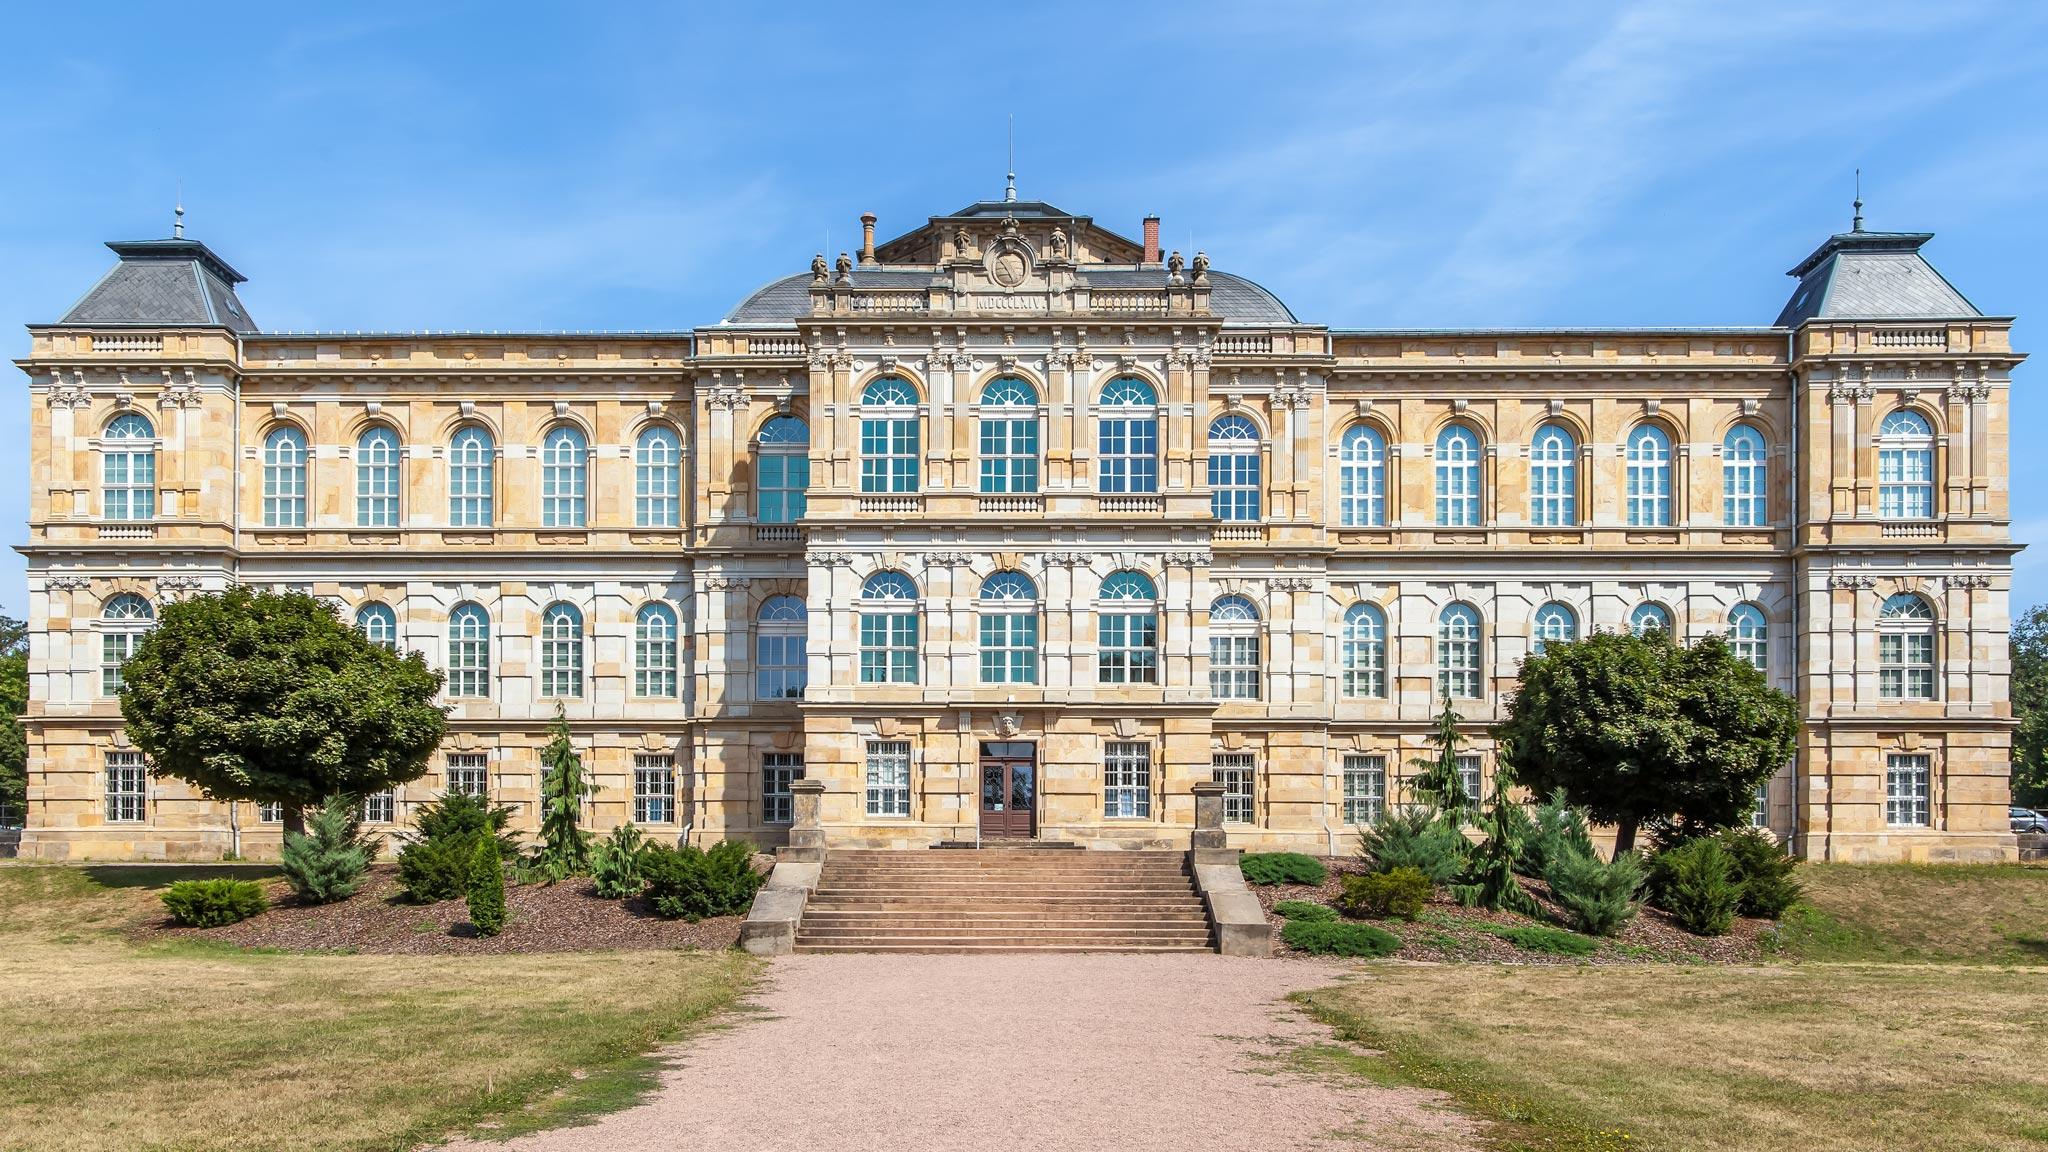 Castillo de Gotha Turingia